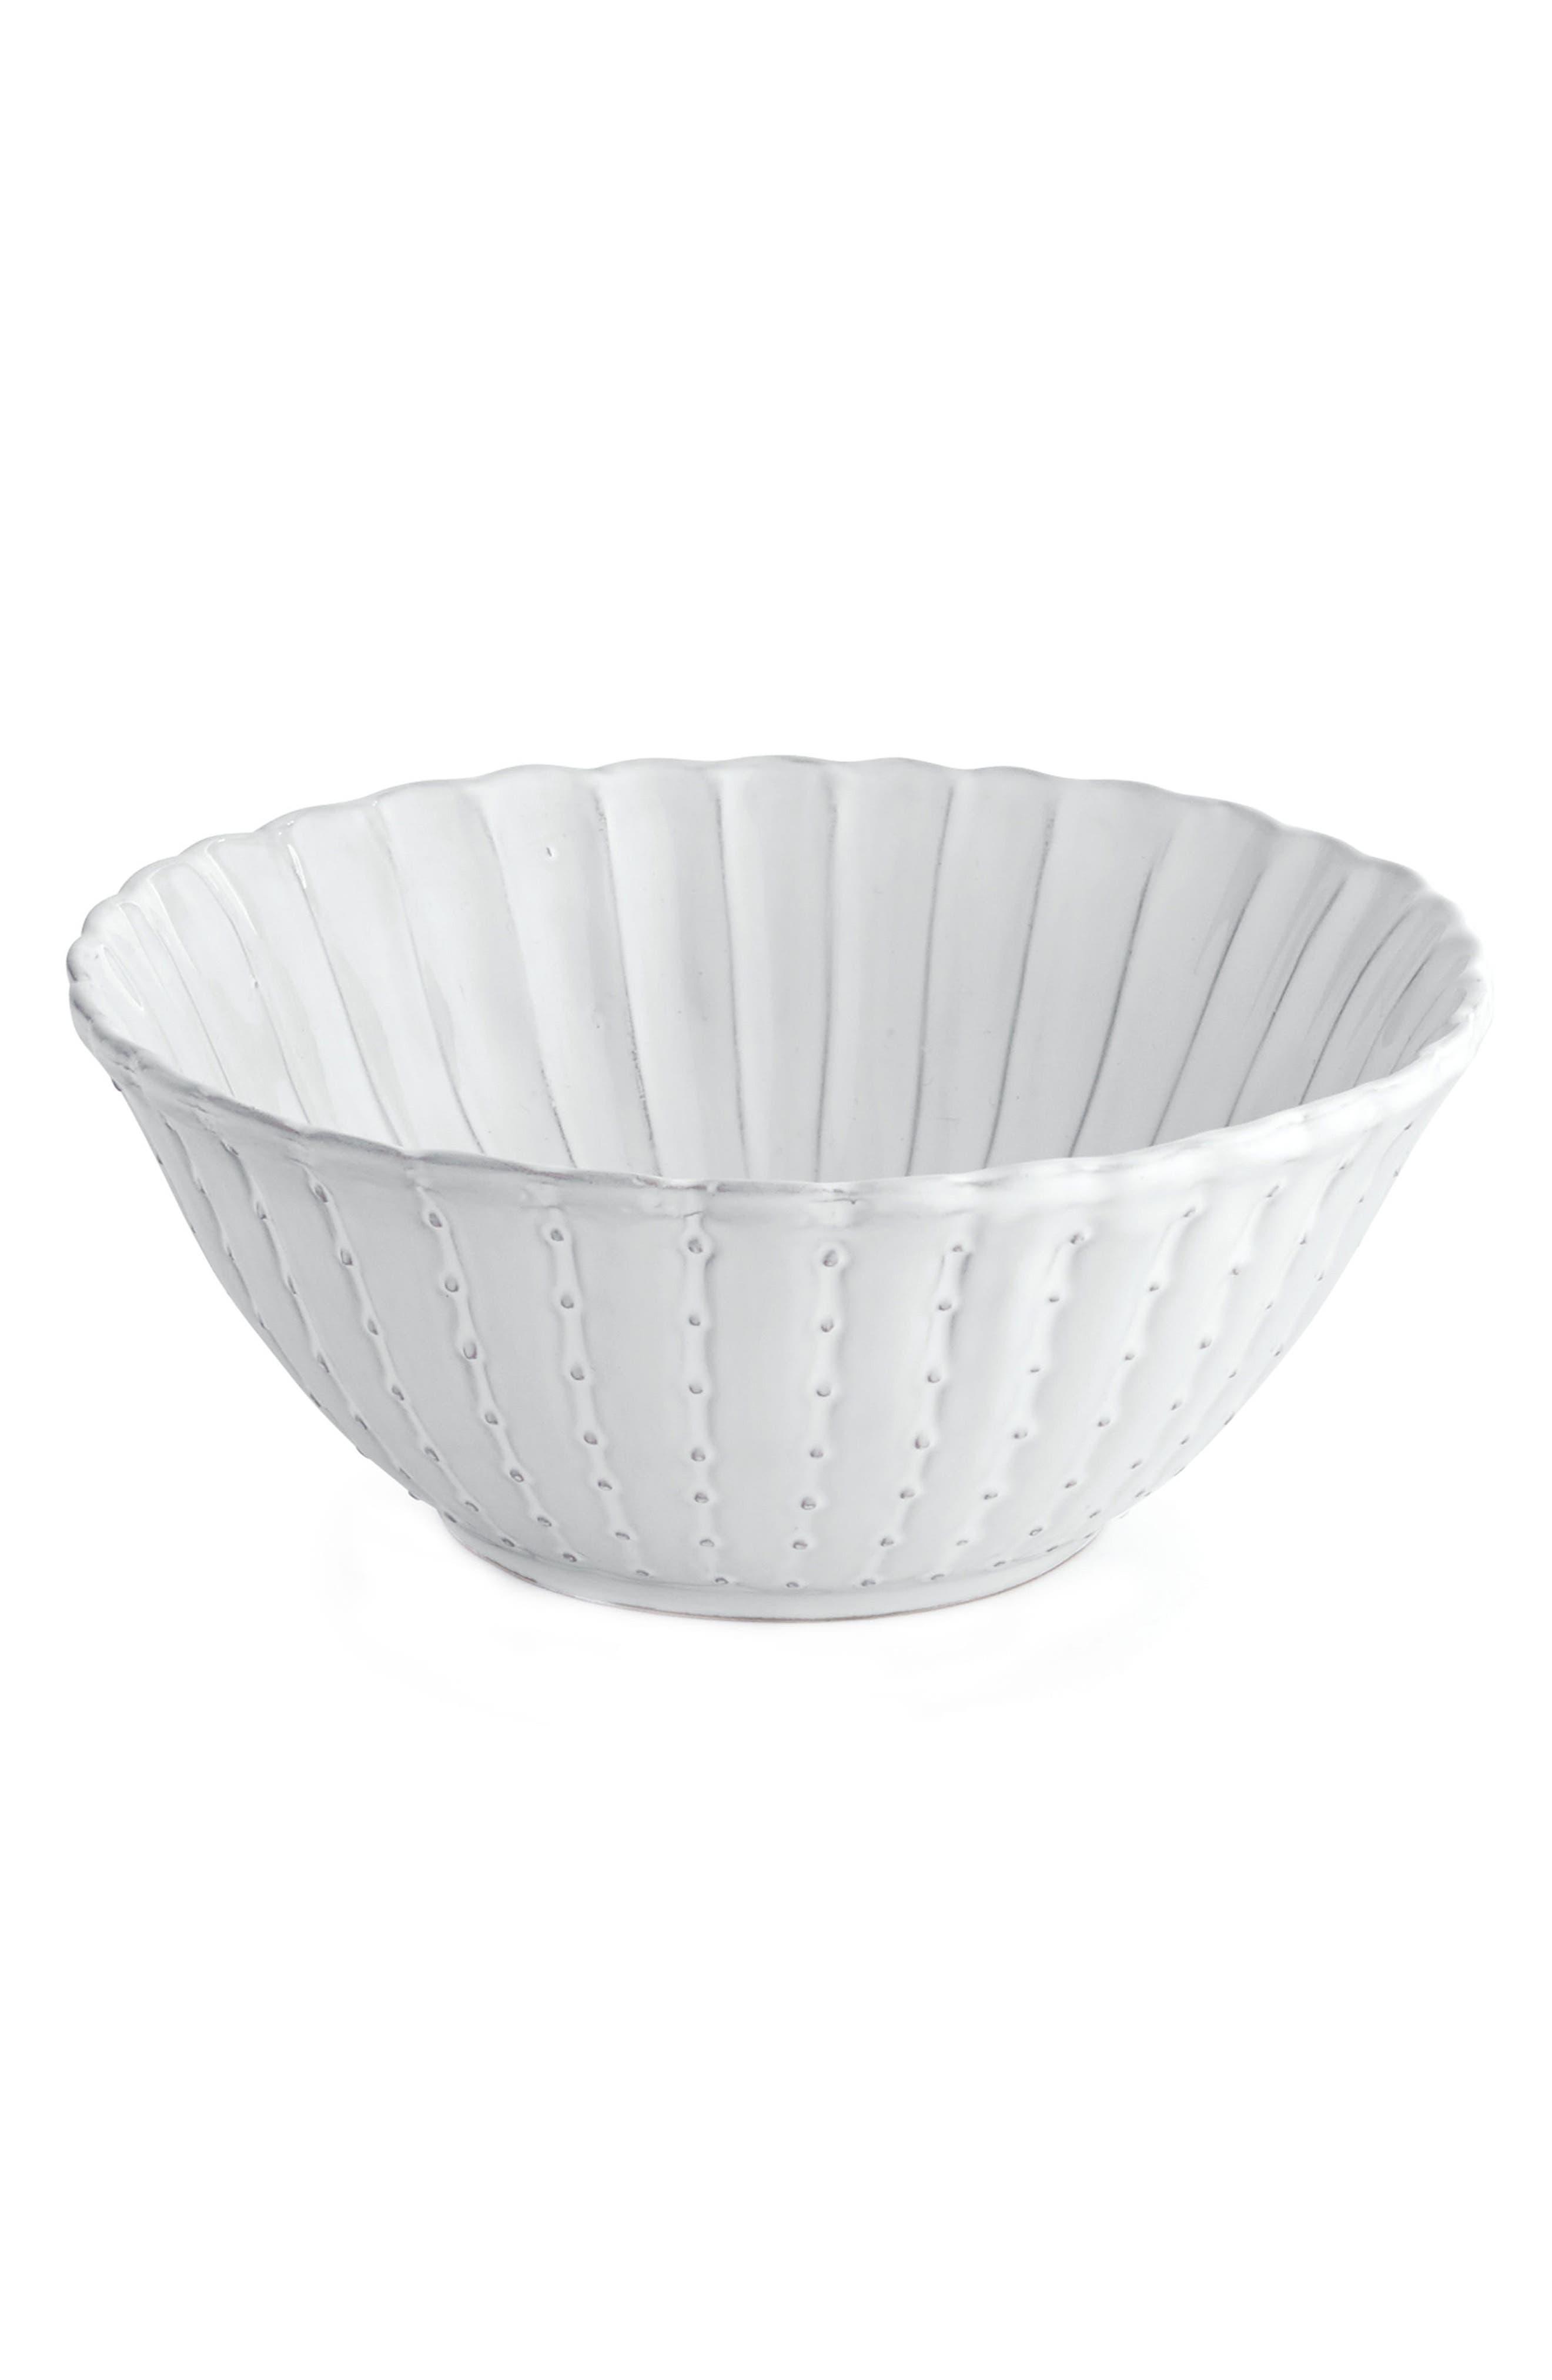 Alternate Image 1 Selected - Arte Italica Bella Bianca Small Stoneware Bowl